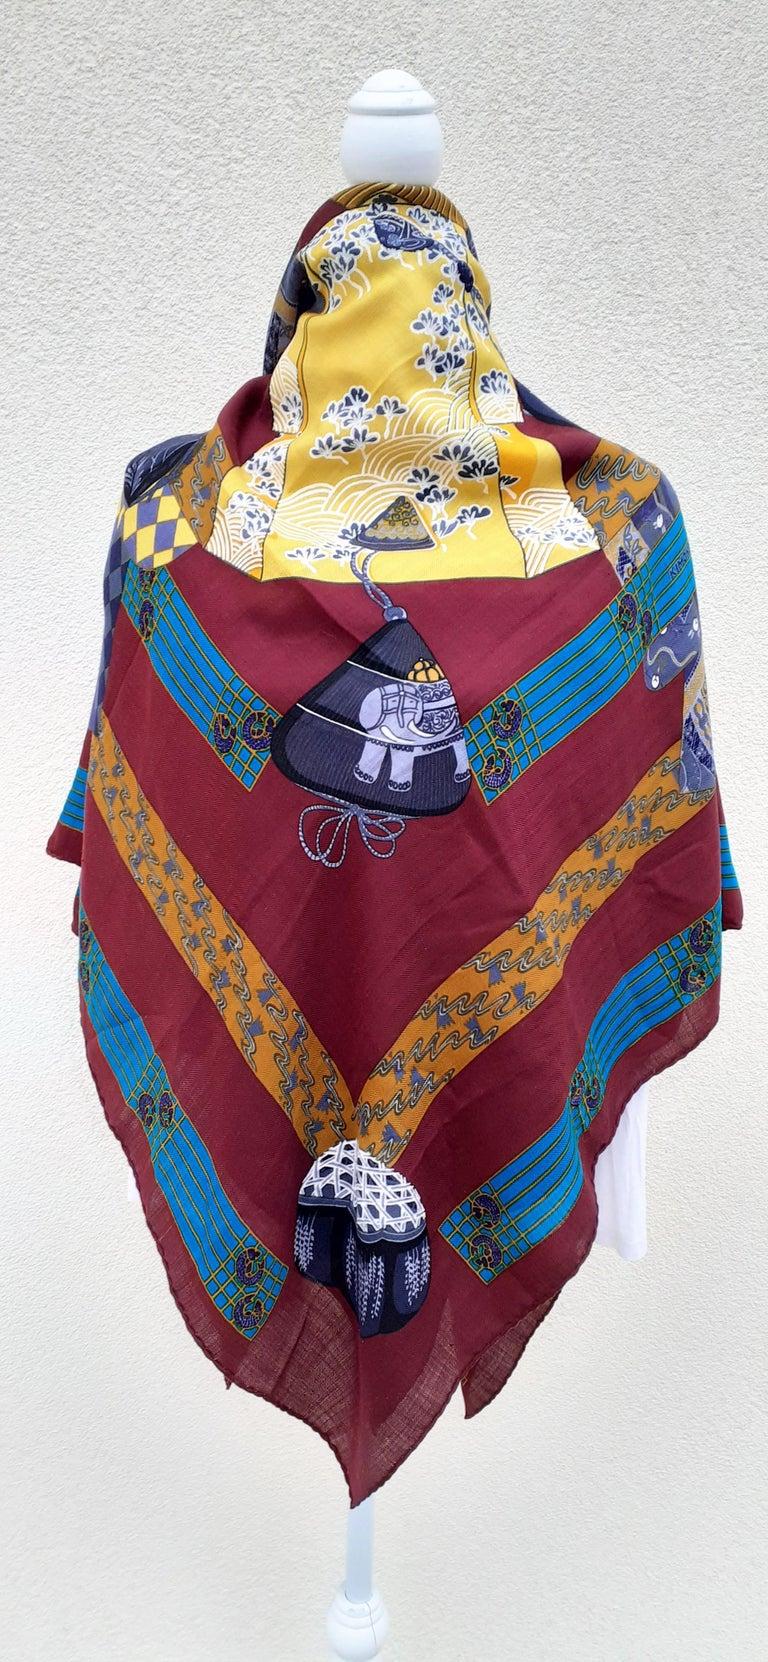 Hermès Shawl Scarf Kimonos et Inros Annie Faivre Cashmere Silk 54 inches For Sale 12